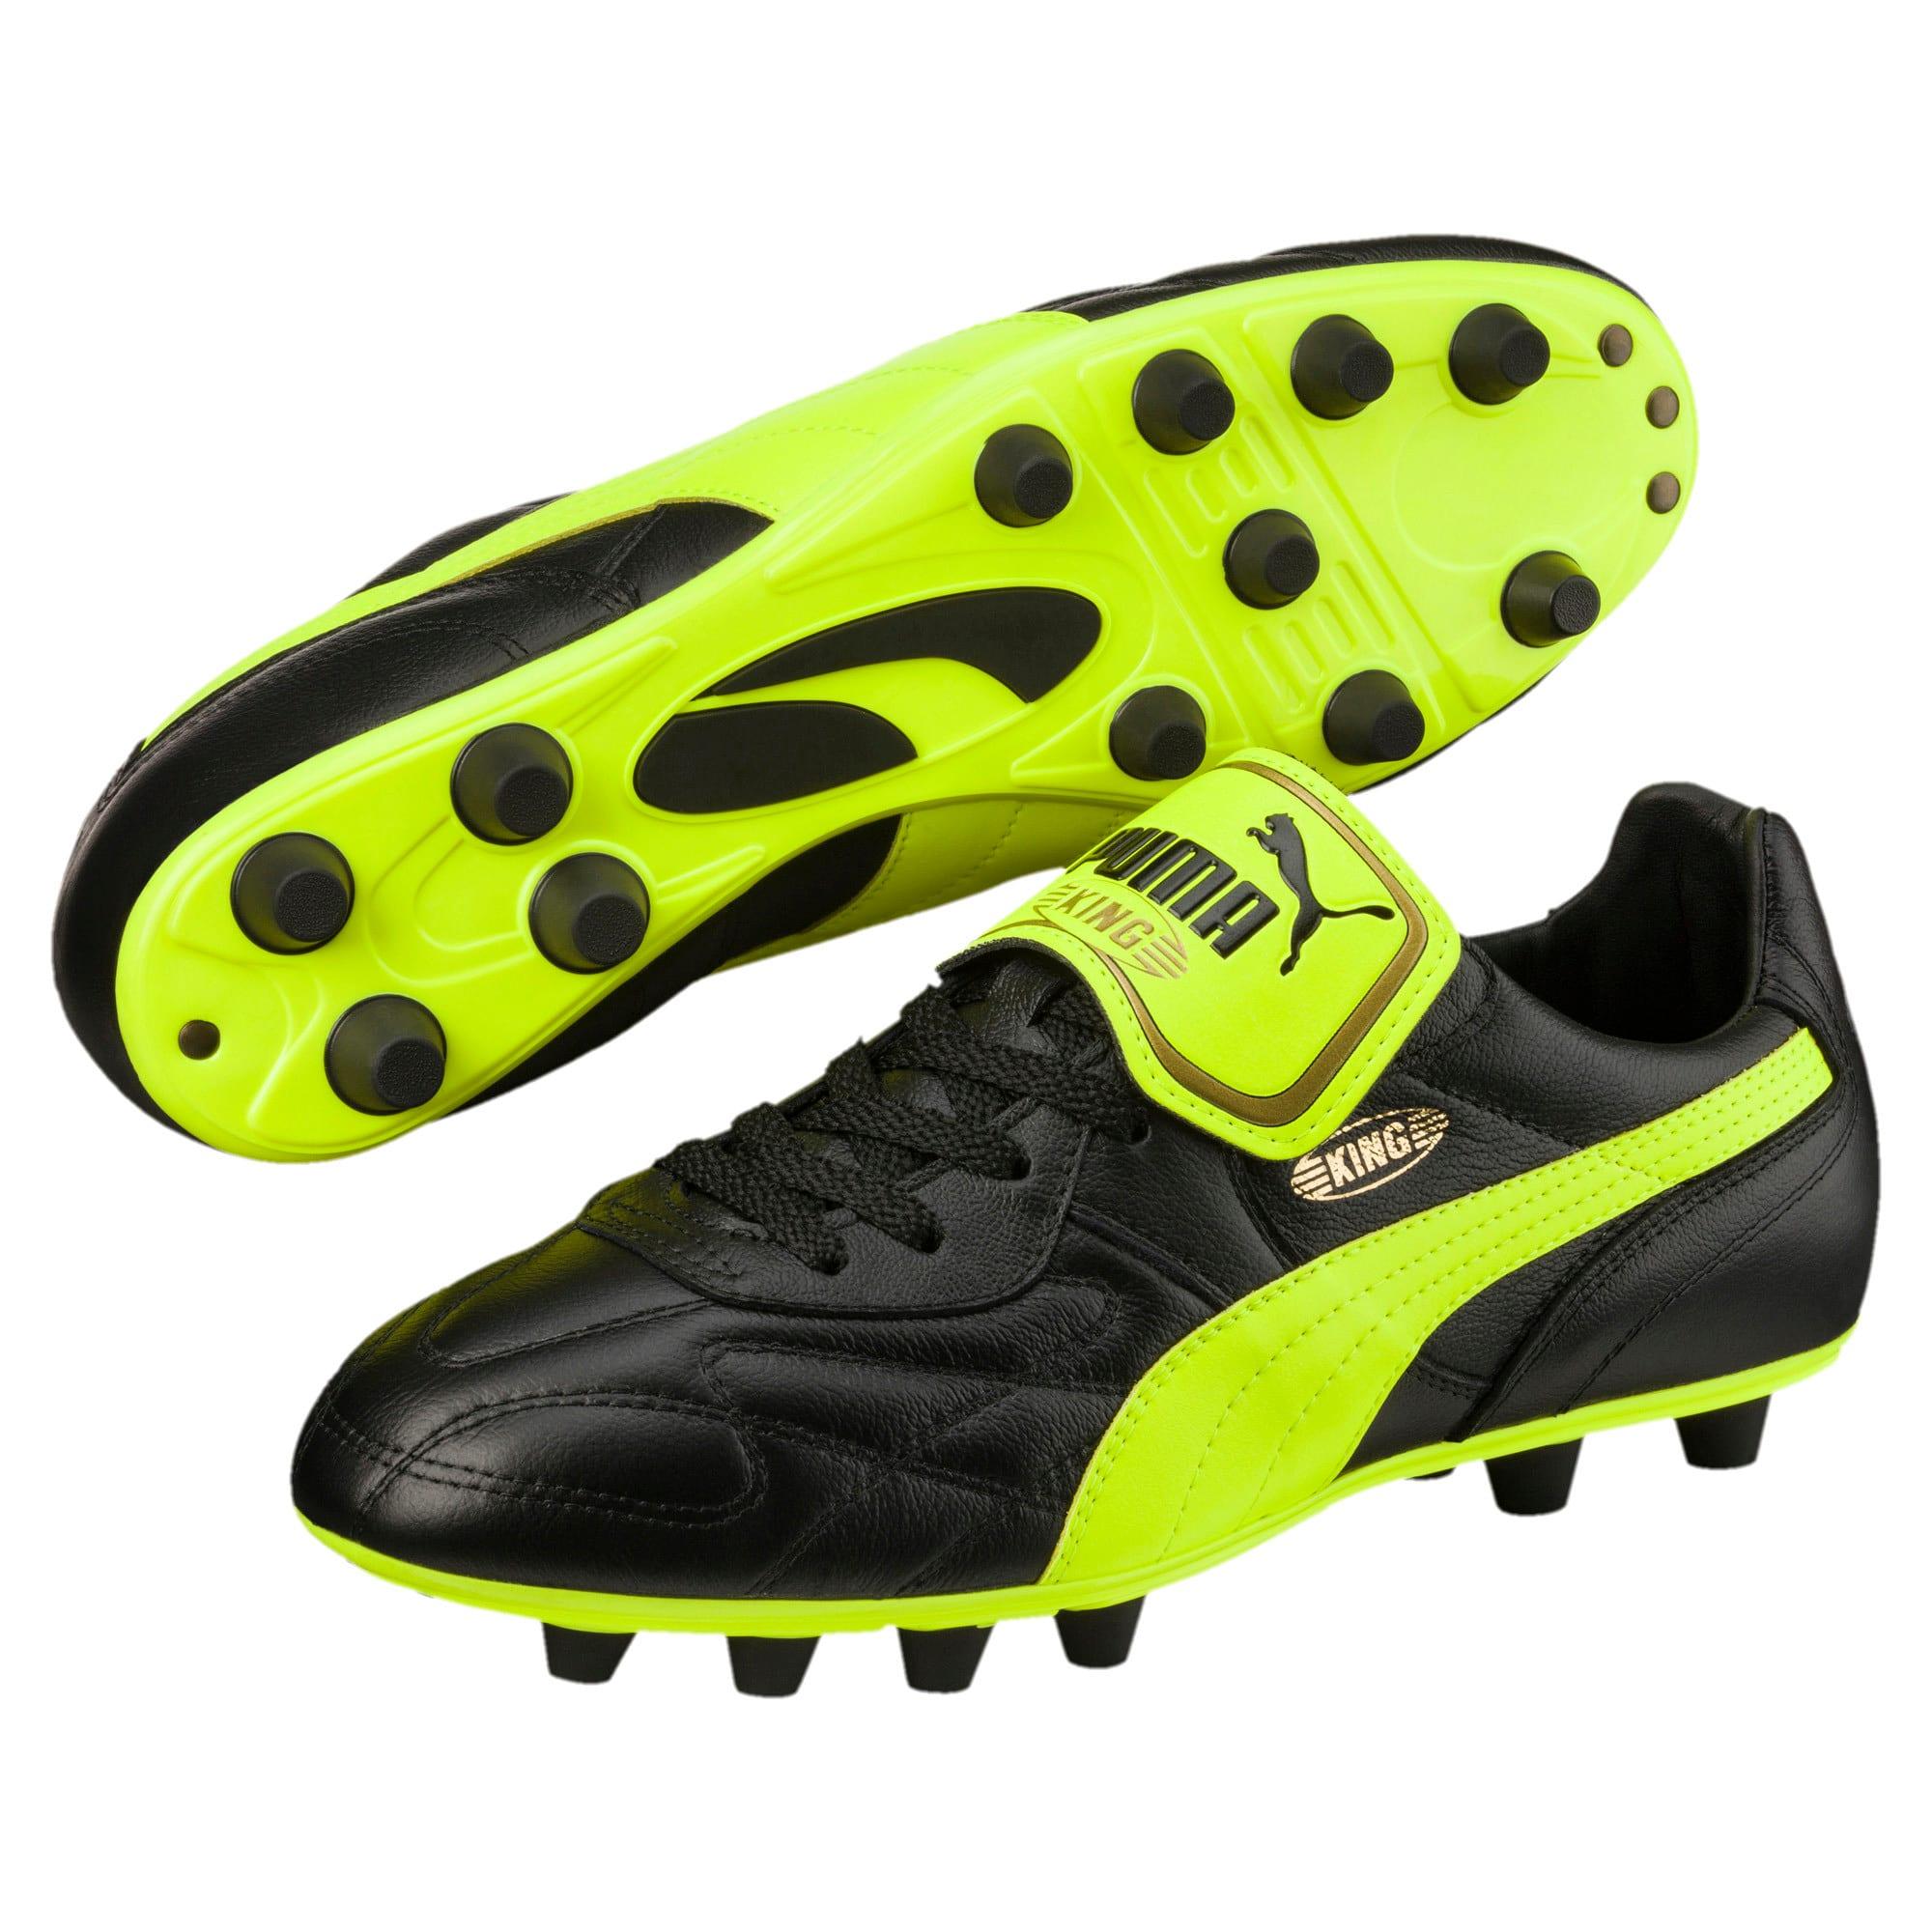 rencontrer 83872 c0d5f King Top Italian FG Men's Soccer Cleats